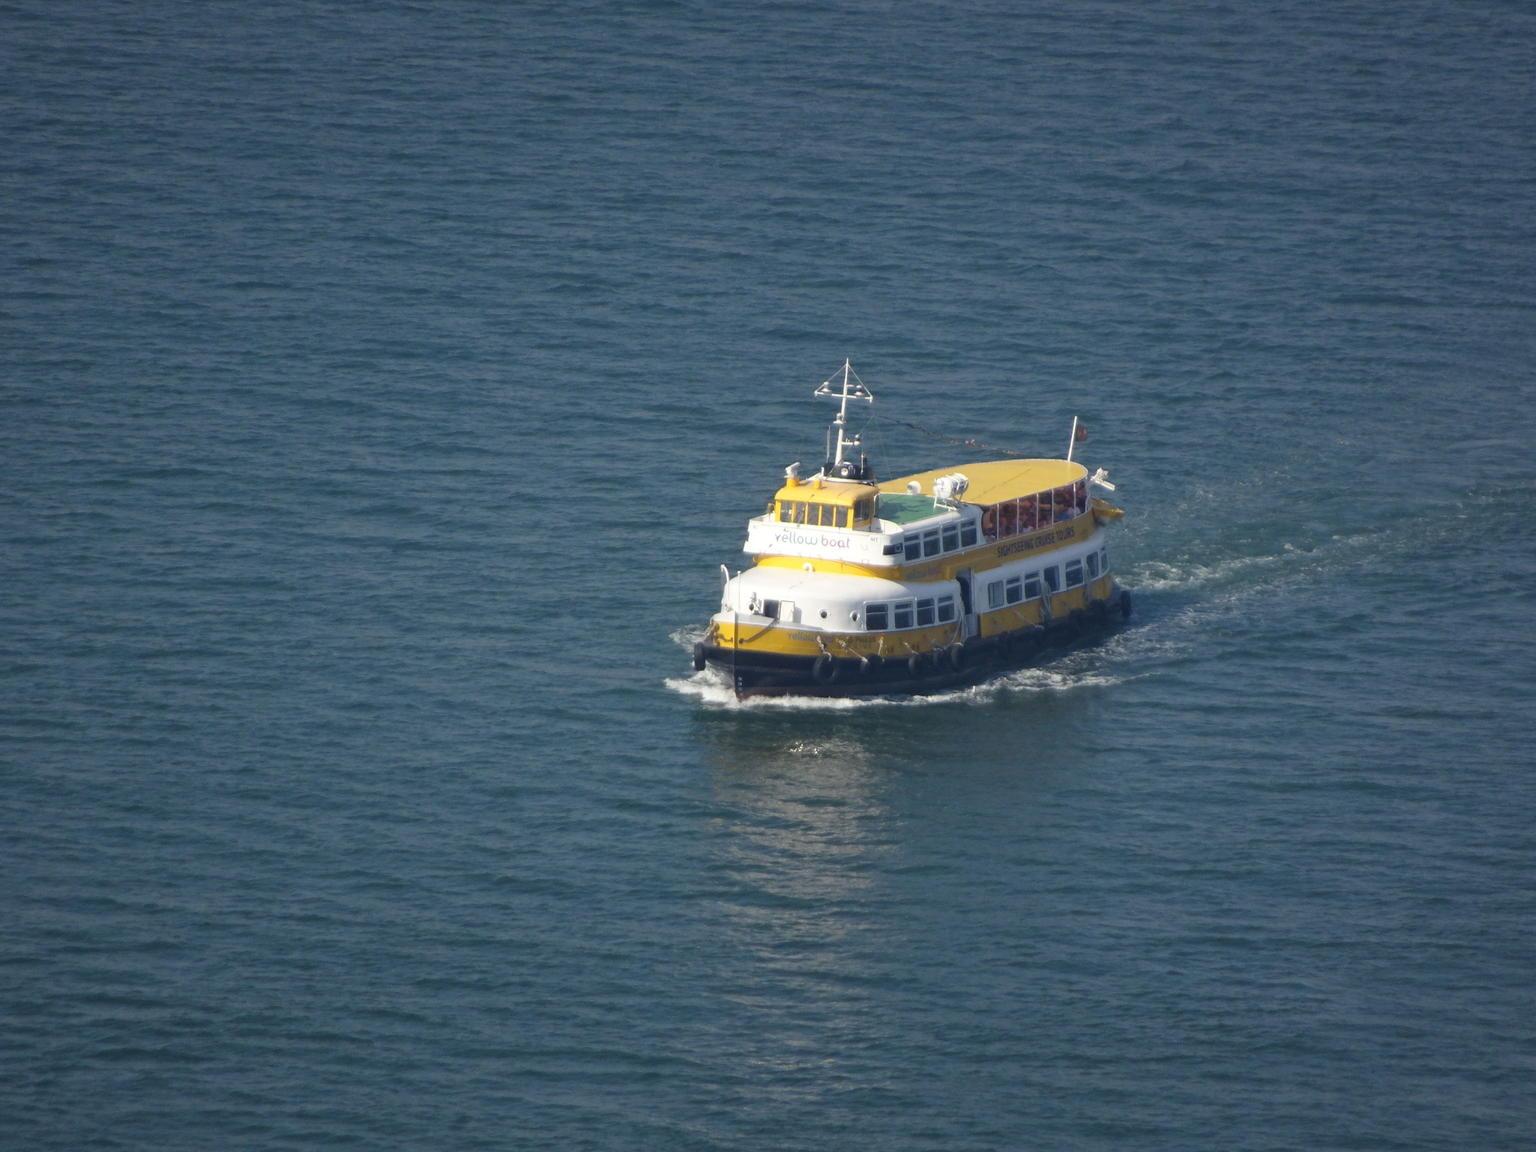 MÁS FOTOS, Recorrido en barco amarillo con paradas libres por Lisboa